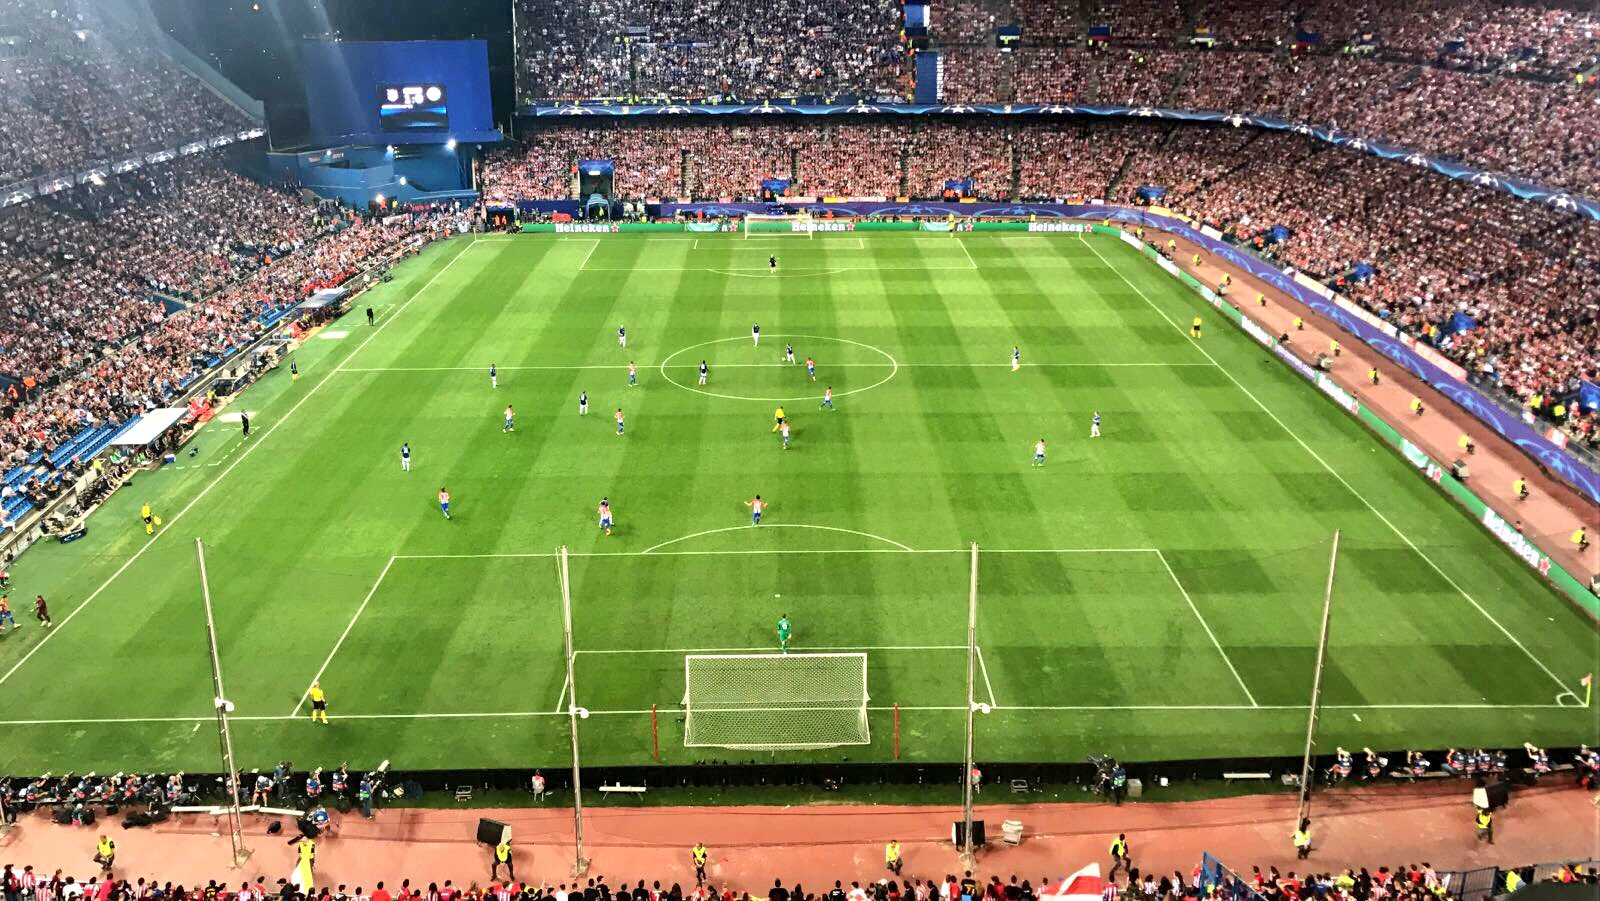 Unreal scenes here at the Vicente Calderón Stadium.... #AtmLei still 1-0 up...!!! https://t.co/3Oc4TkJhkc